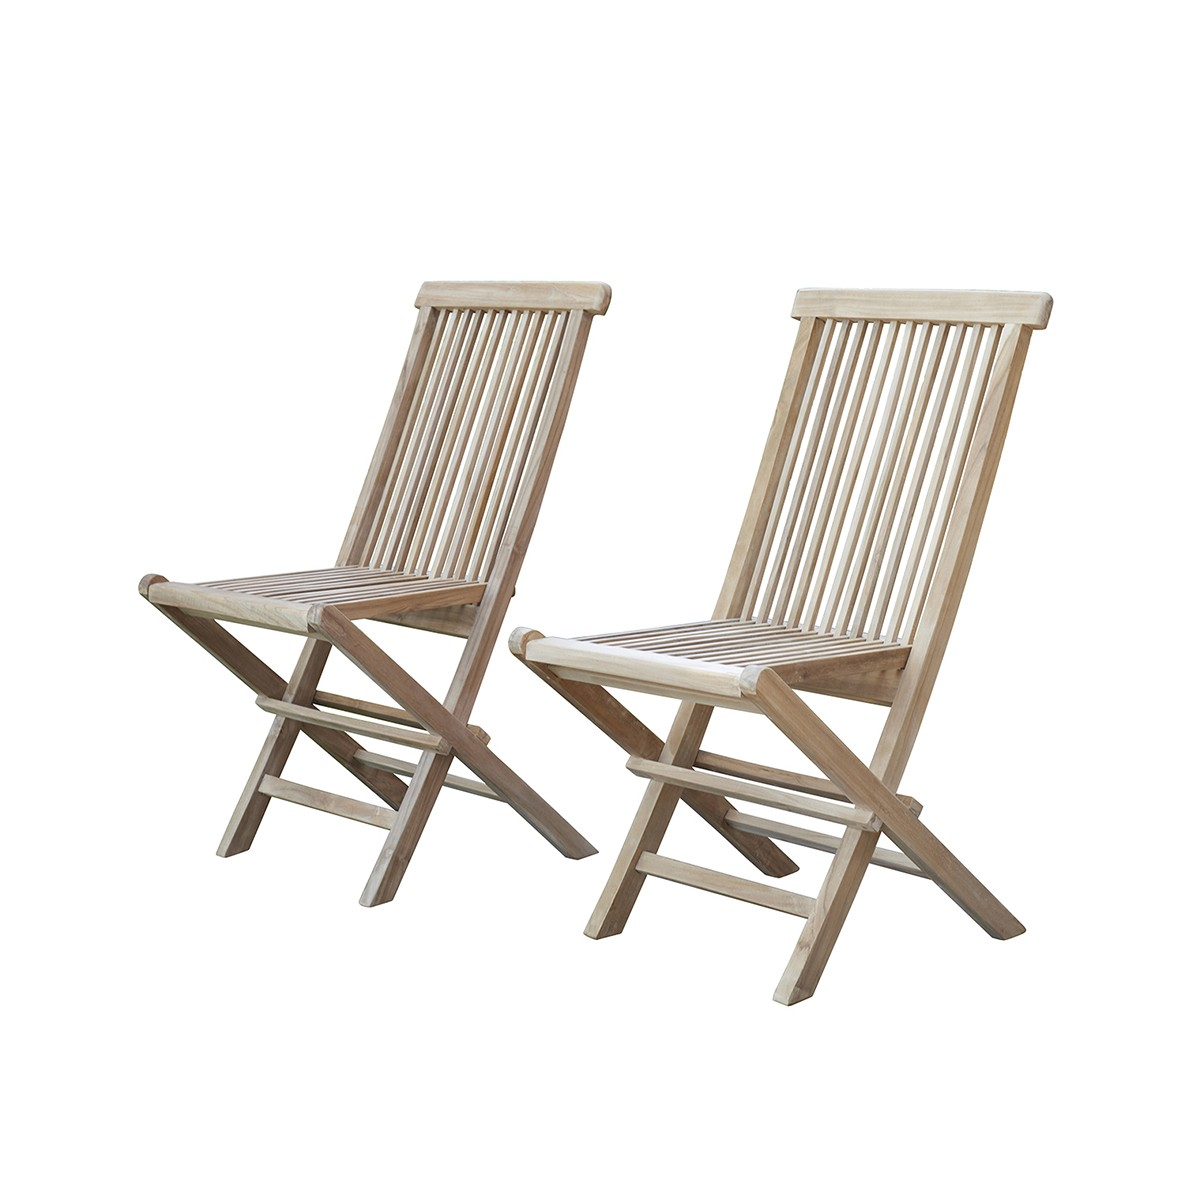 2 chaises de jardin en teck pliantes